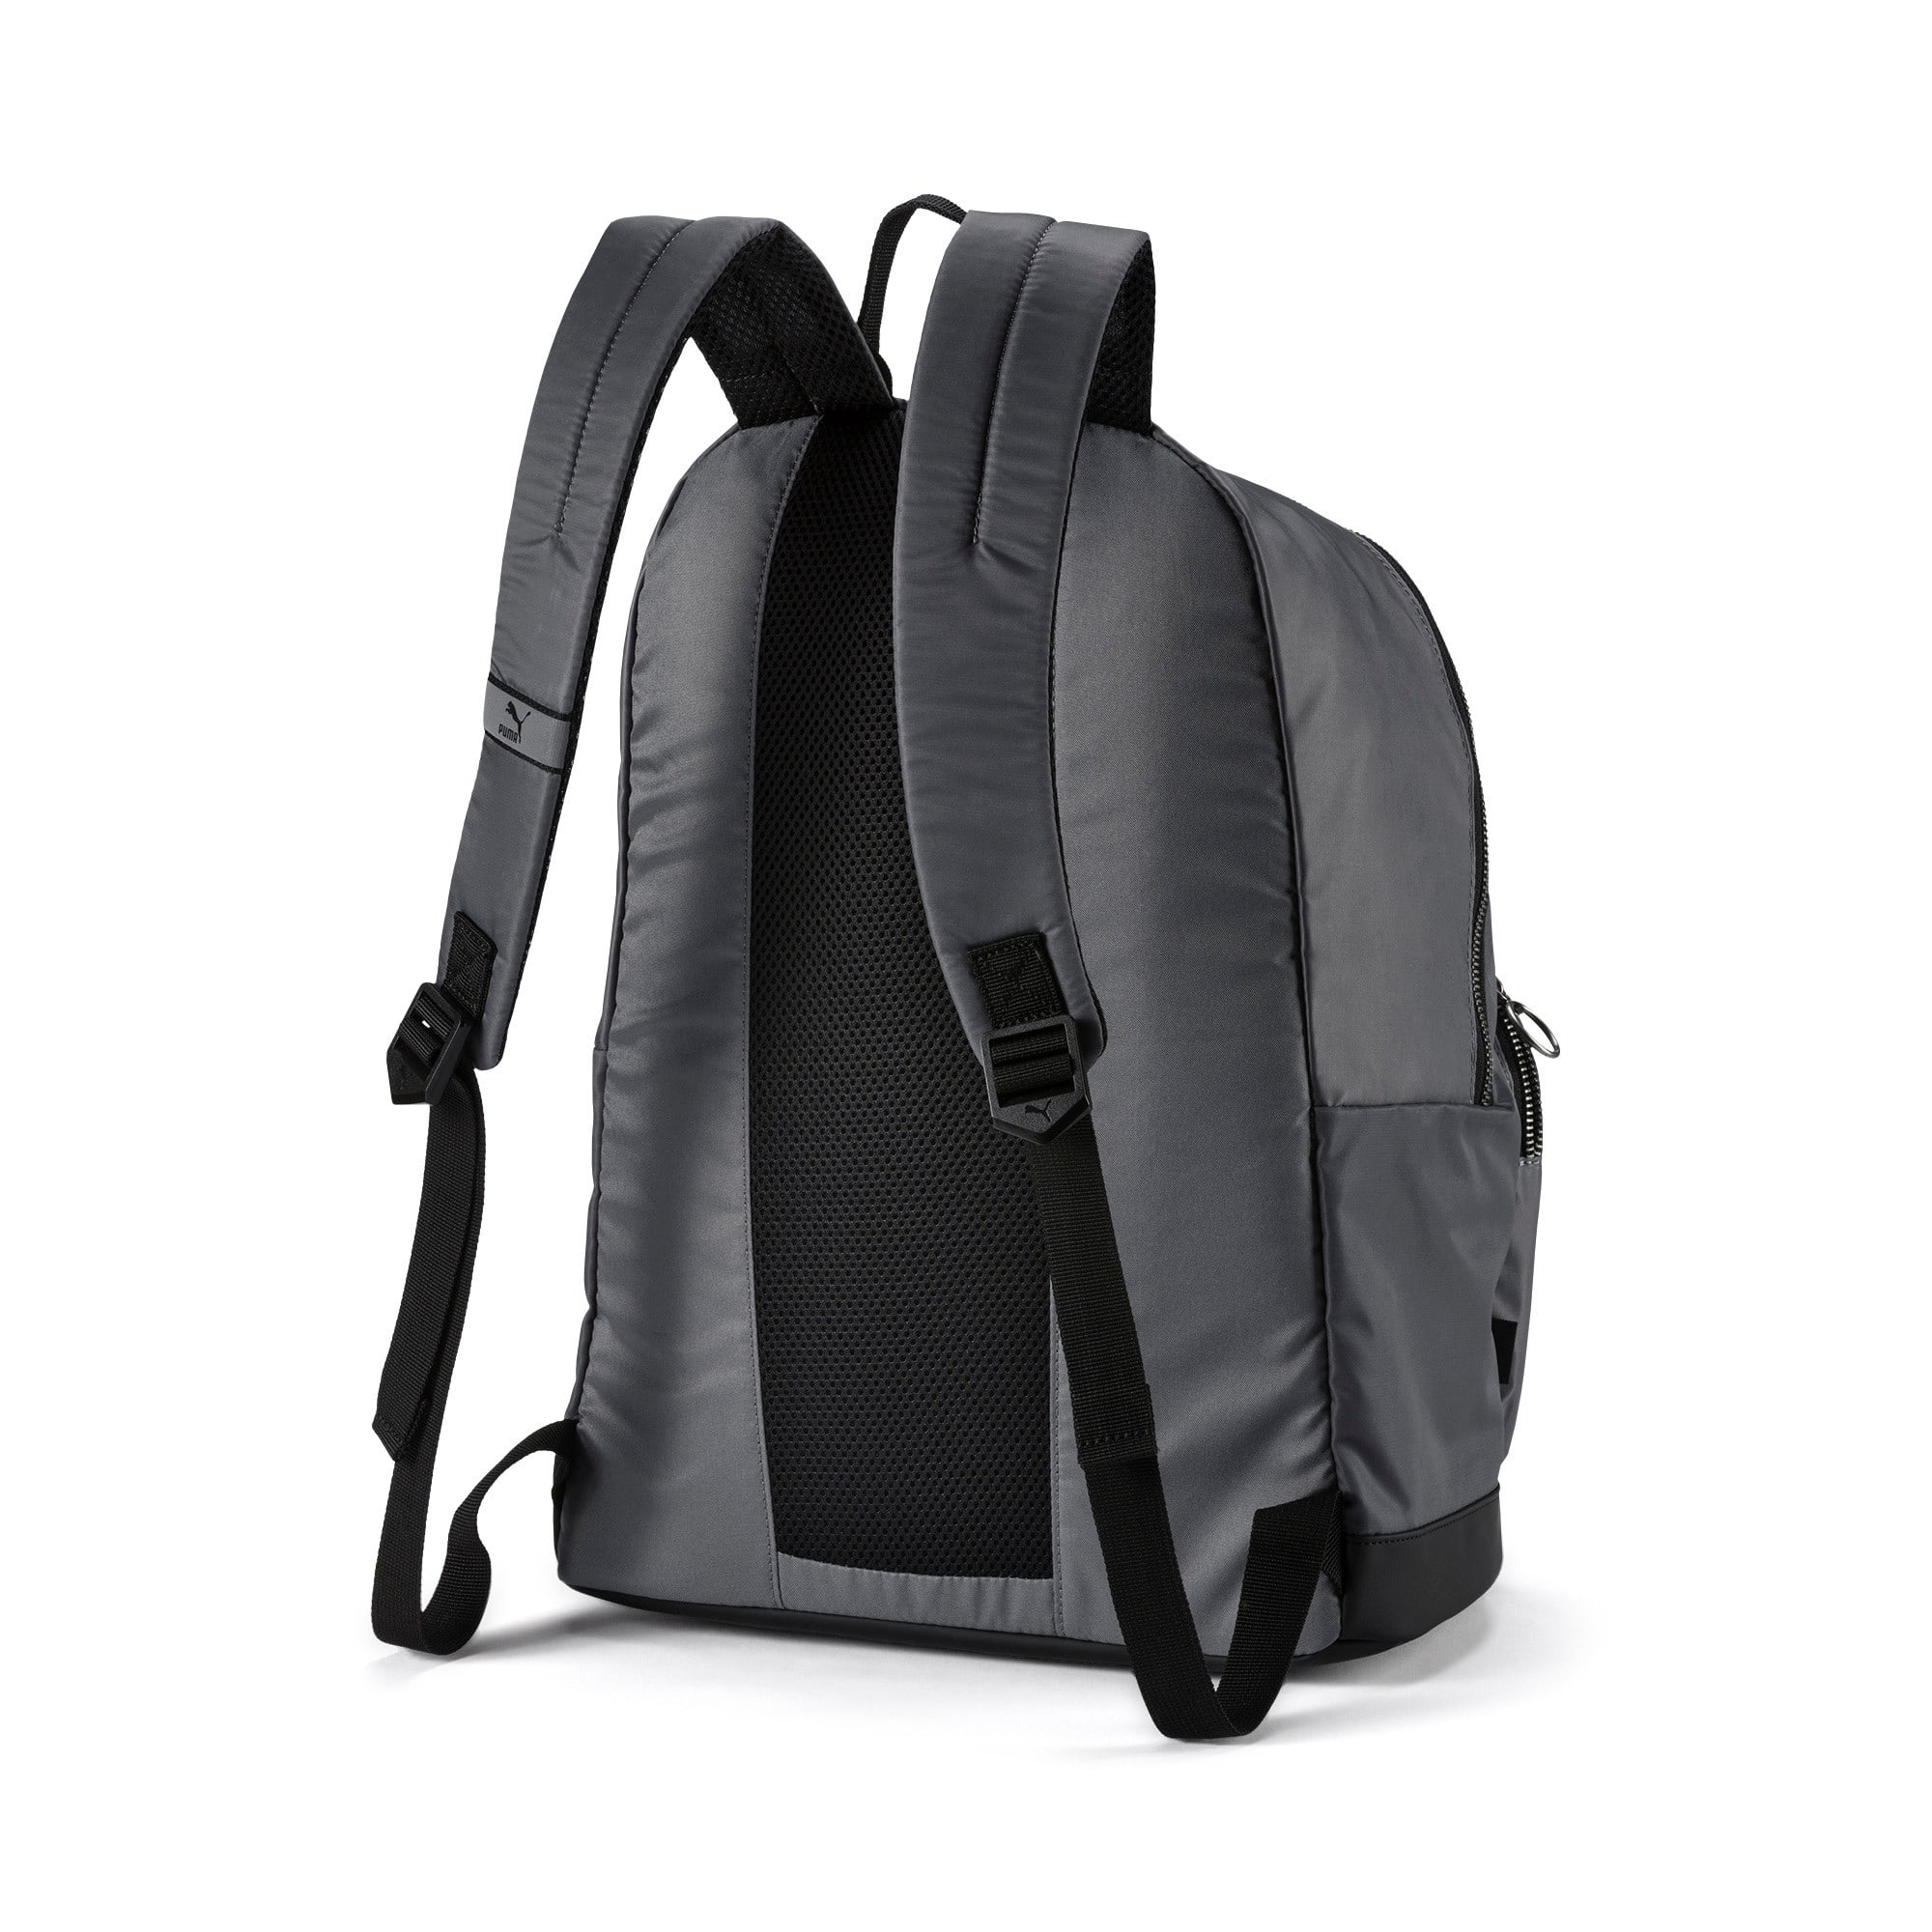 Thumbnail 2 of Originals Trend Backpack, CASTLEROCK, medium